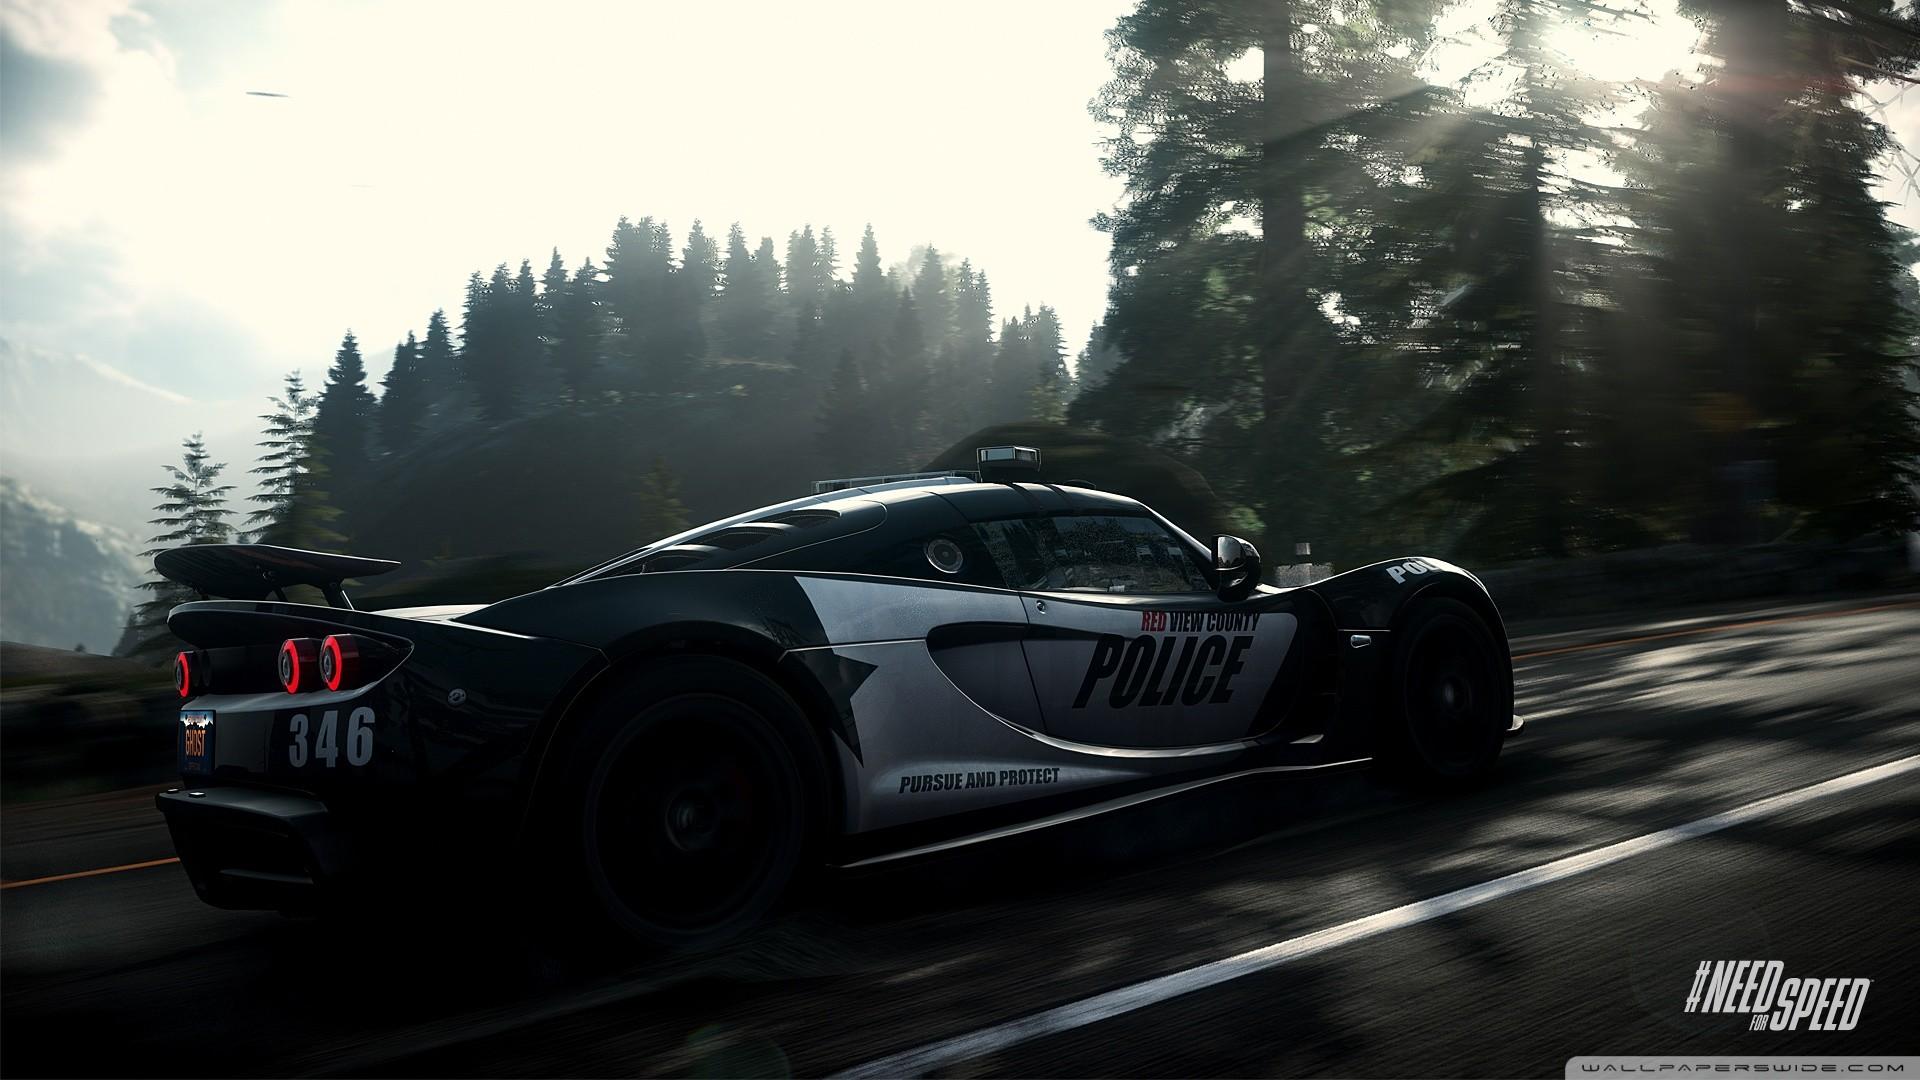 Need for Speed Rivals Police Car HD desktop wallpaper : Widescreen